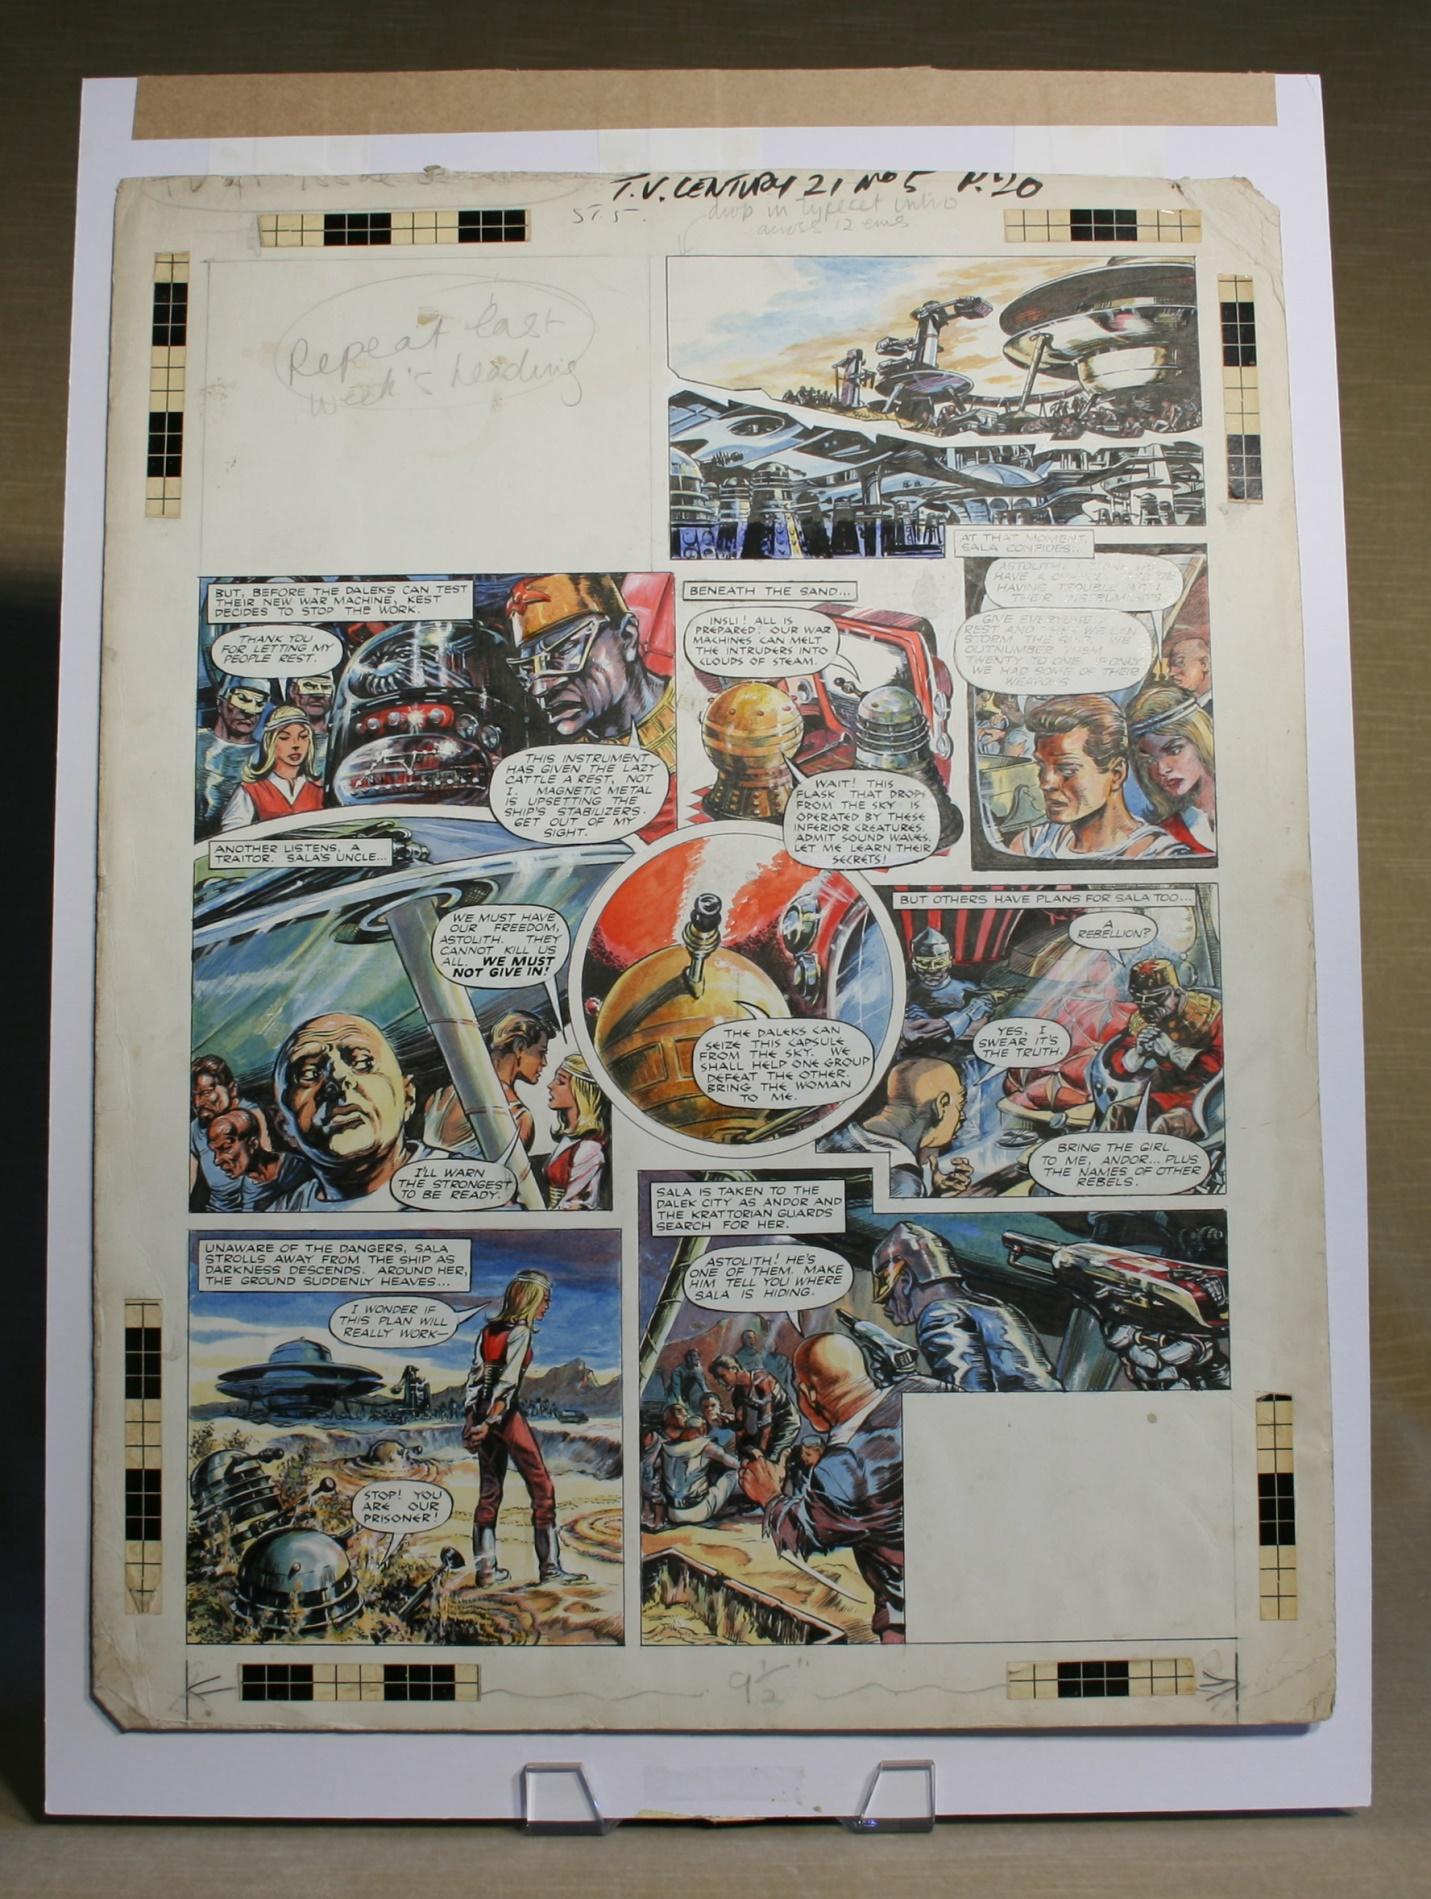 Original Dalek strip artwork from TV Century 21 #5